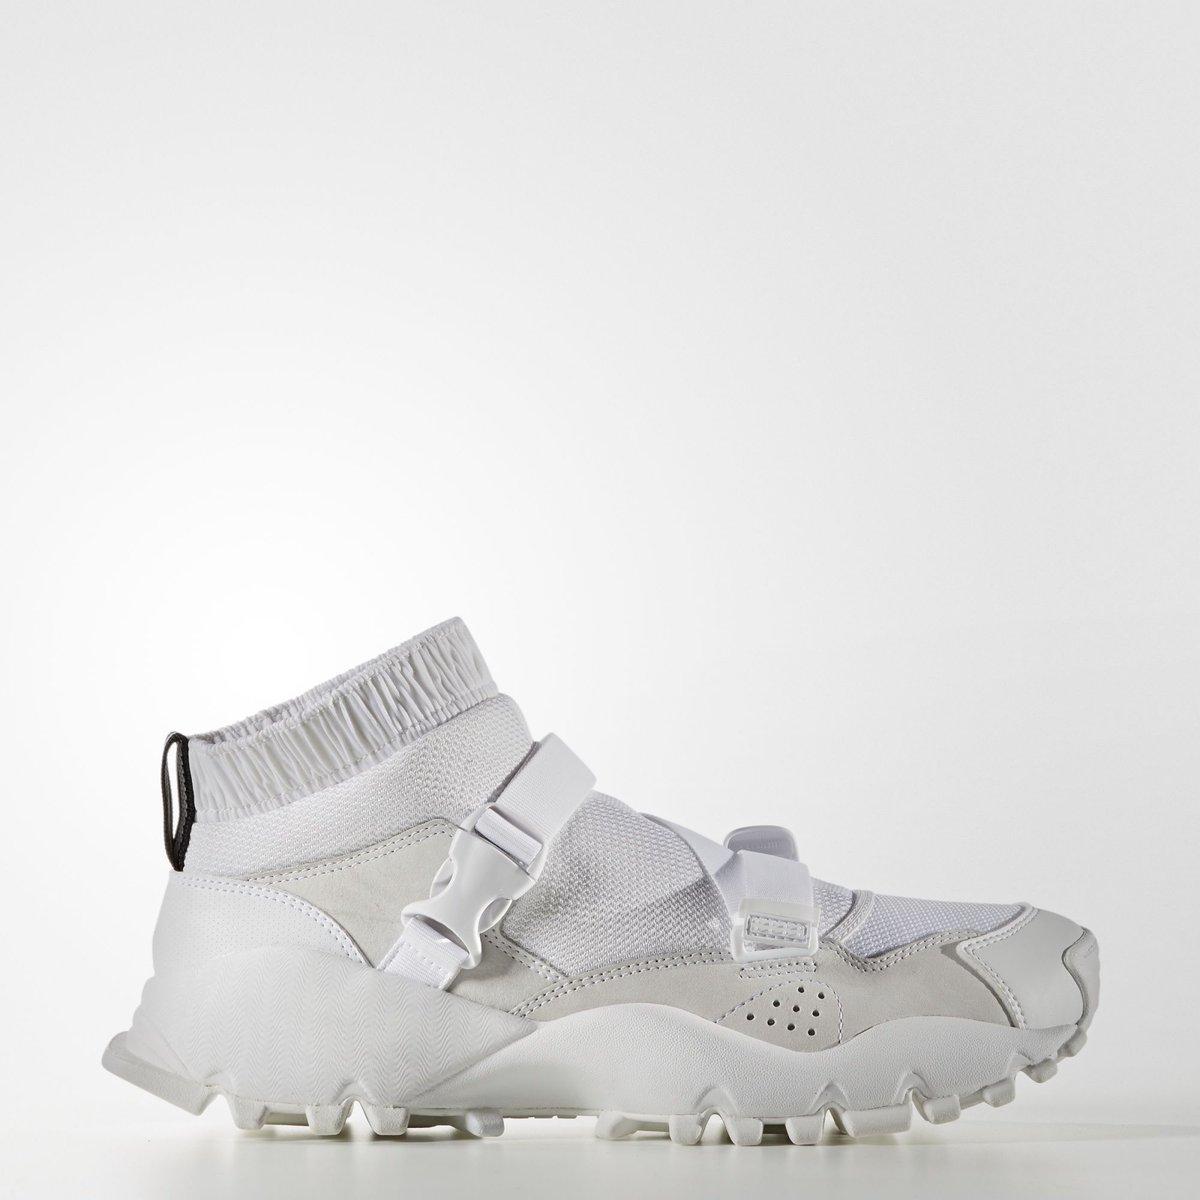 hot sale online f3127 47dc5 adidas alerts on Twitter: